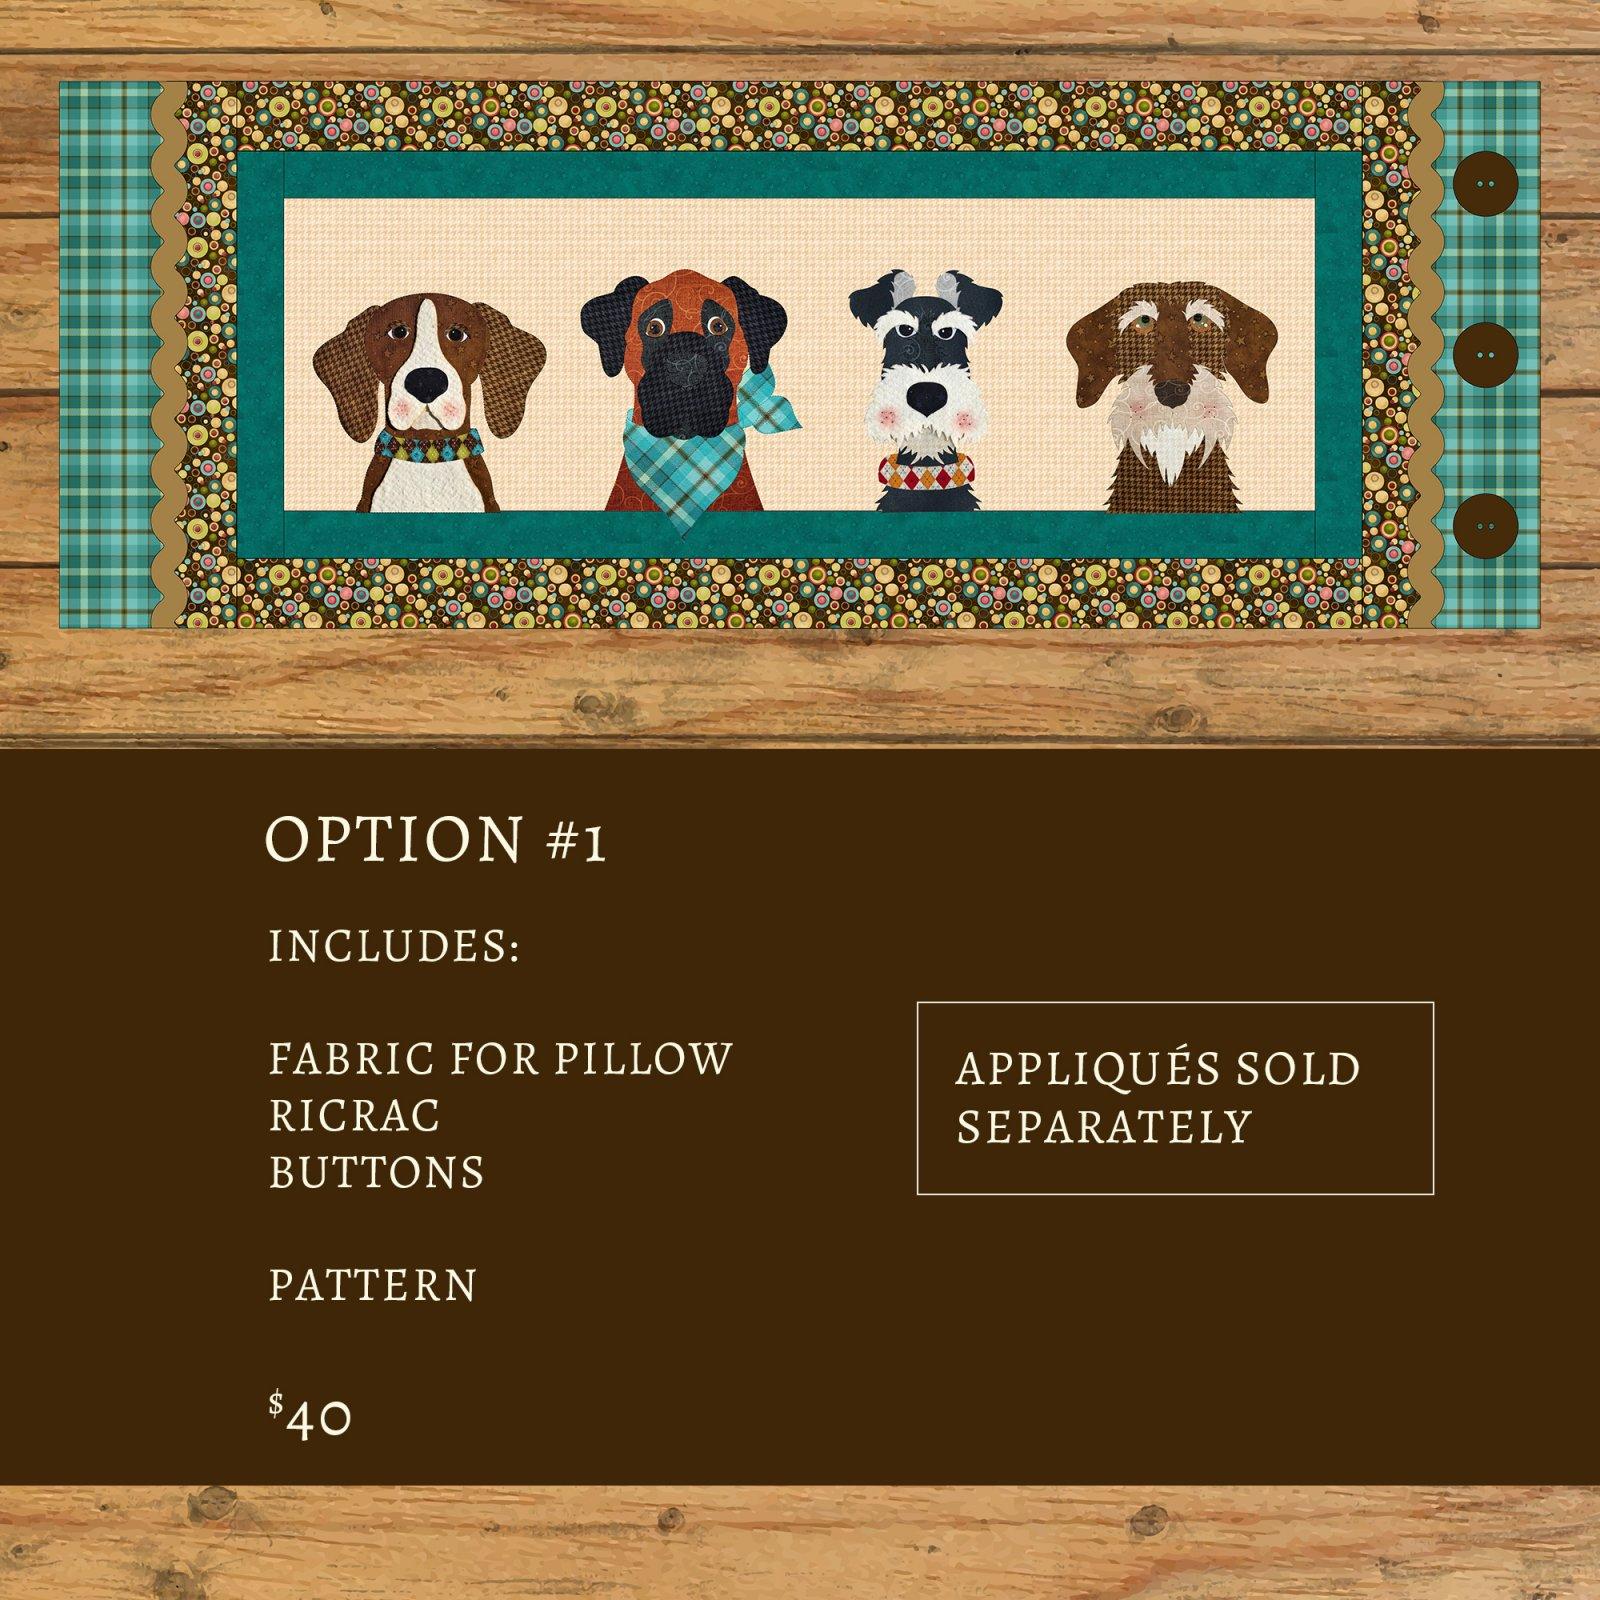 Furry Friends Applique Bench Pillow Kit